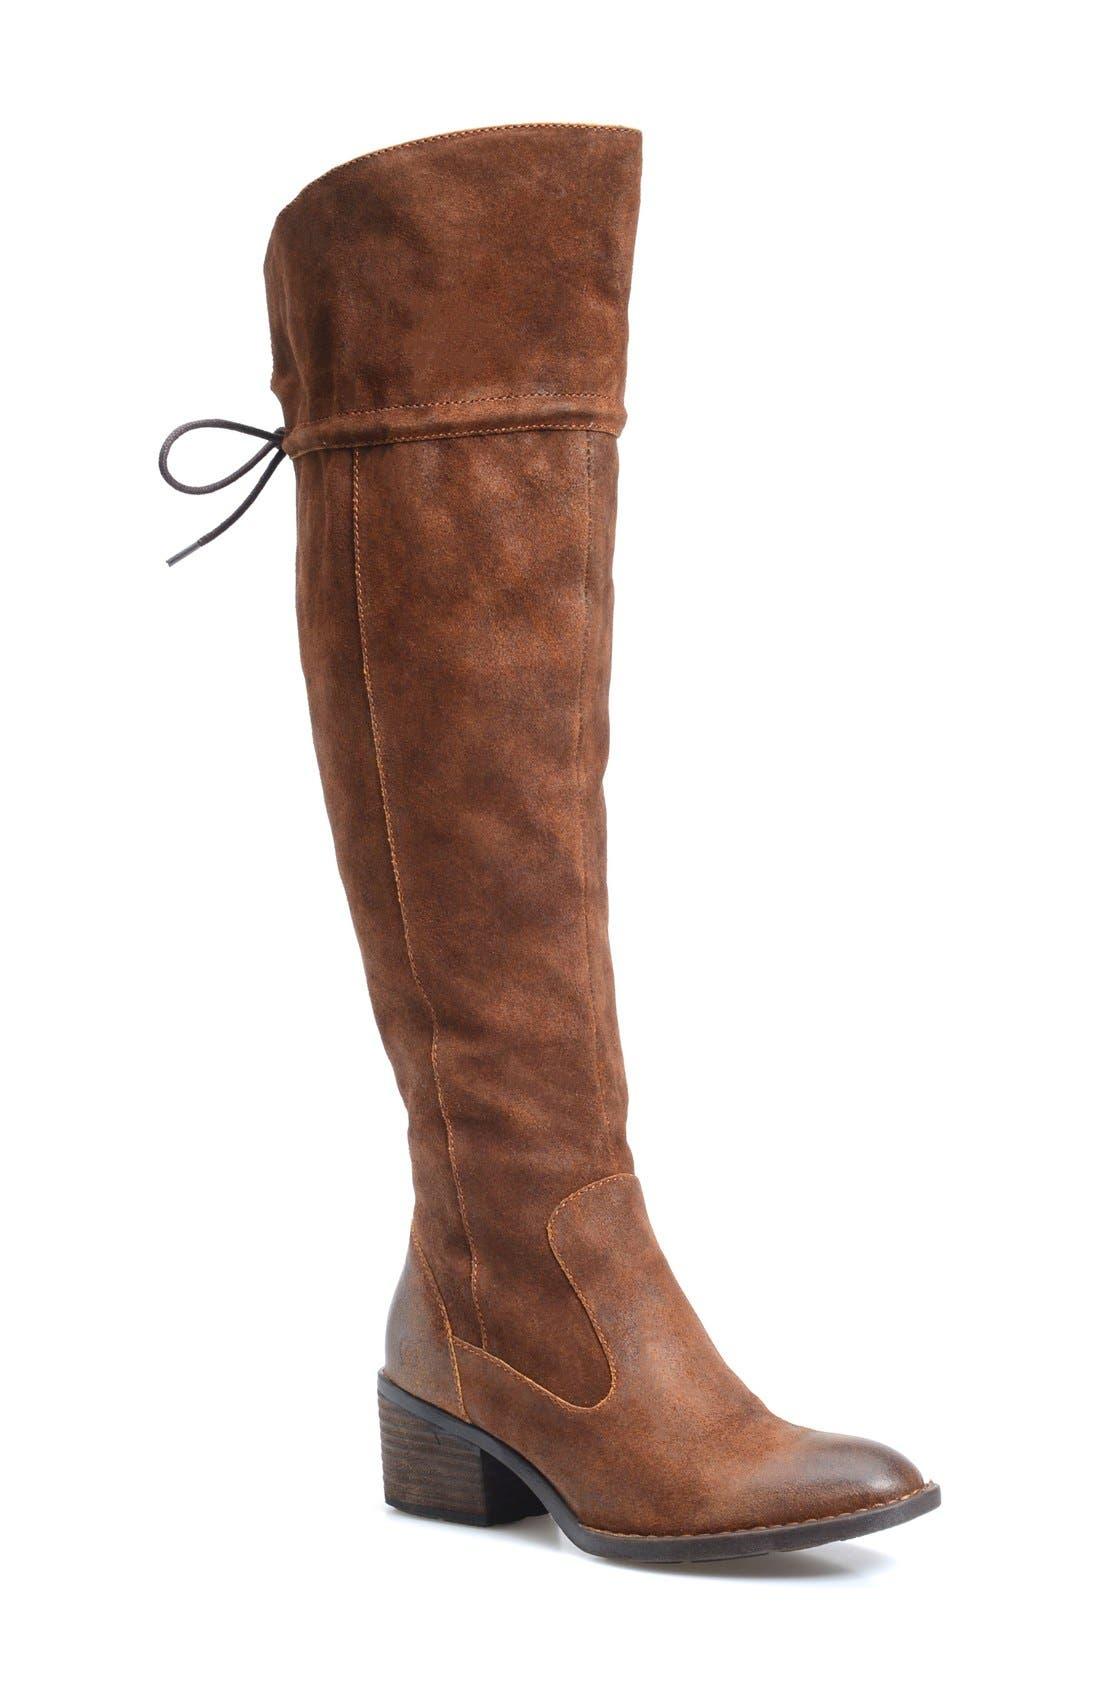 Main Image - Børn 'Gallinara' Over the Knee Boot (Women)